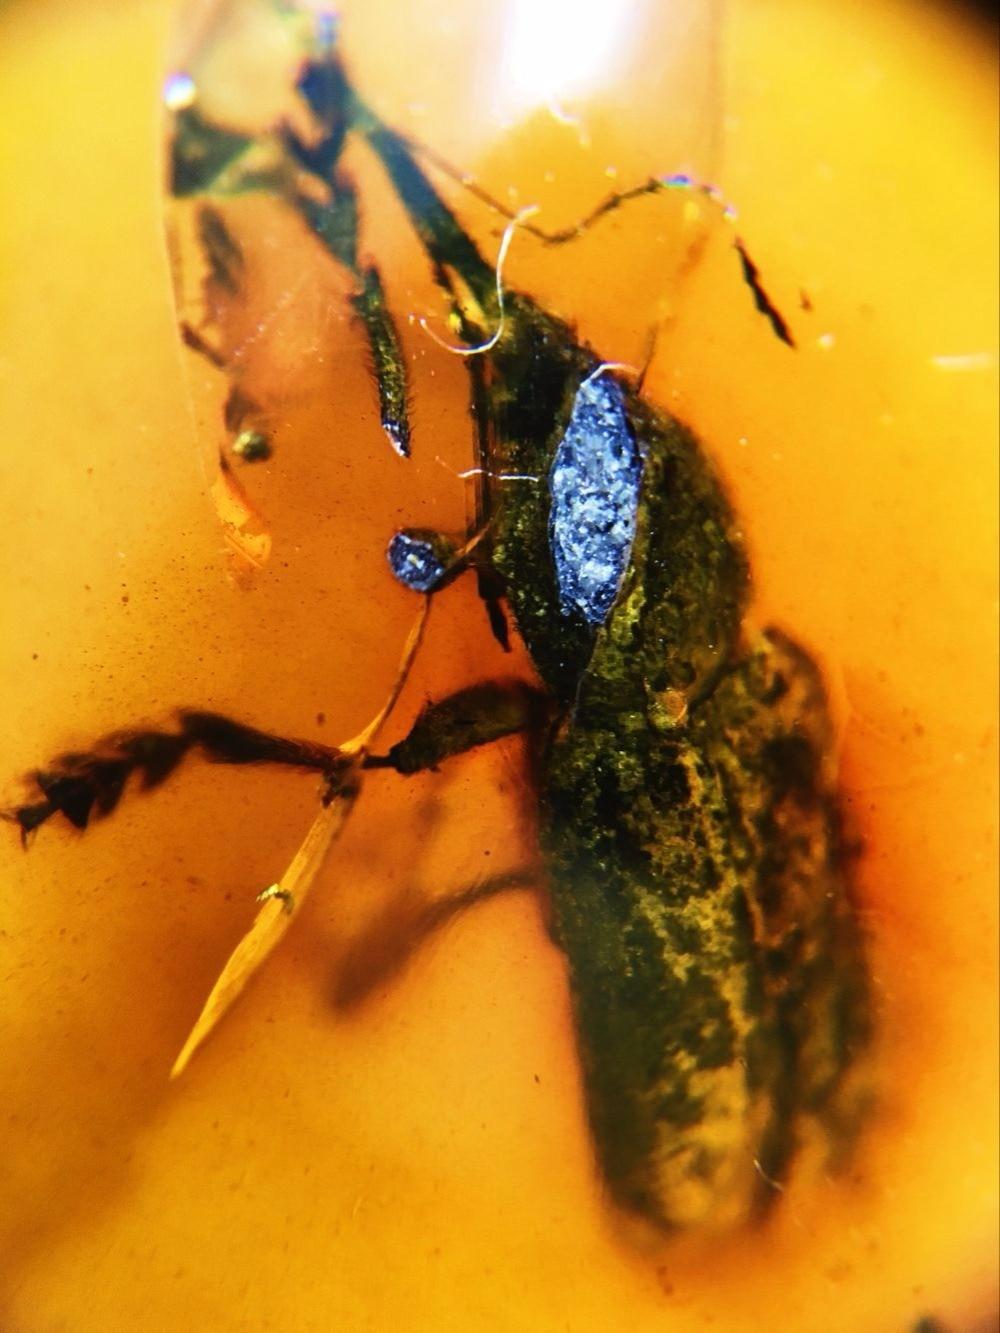 (15mm) curculionidae weevil long trunk beetle untreated burmite Myanmar Burma Amber insect lynx stone dinosaurs age Cretaceous цена